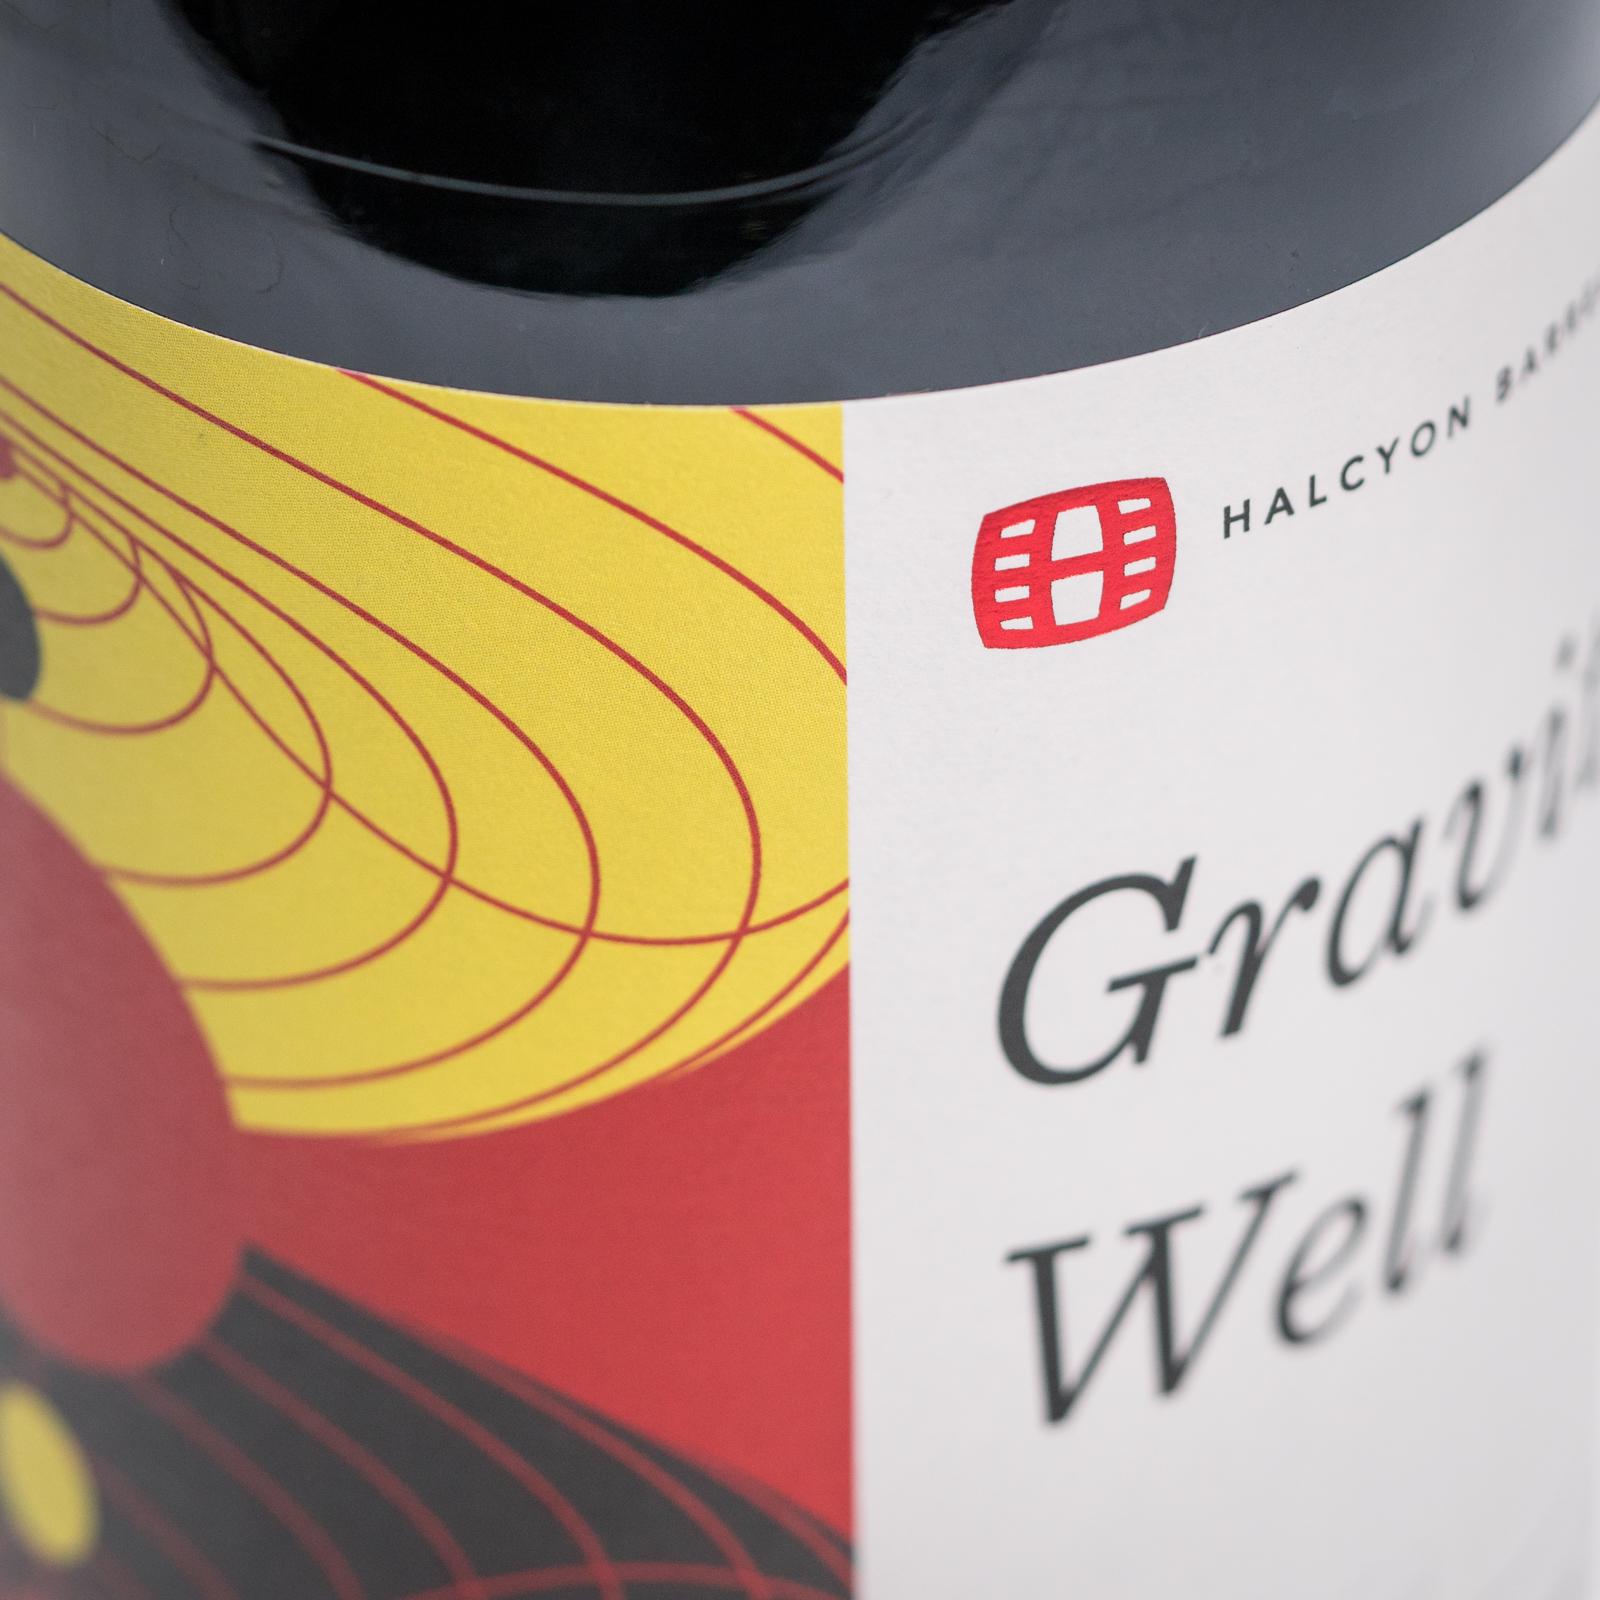 halcyon gravity well9.jpg